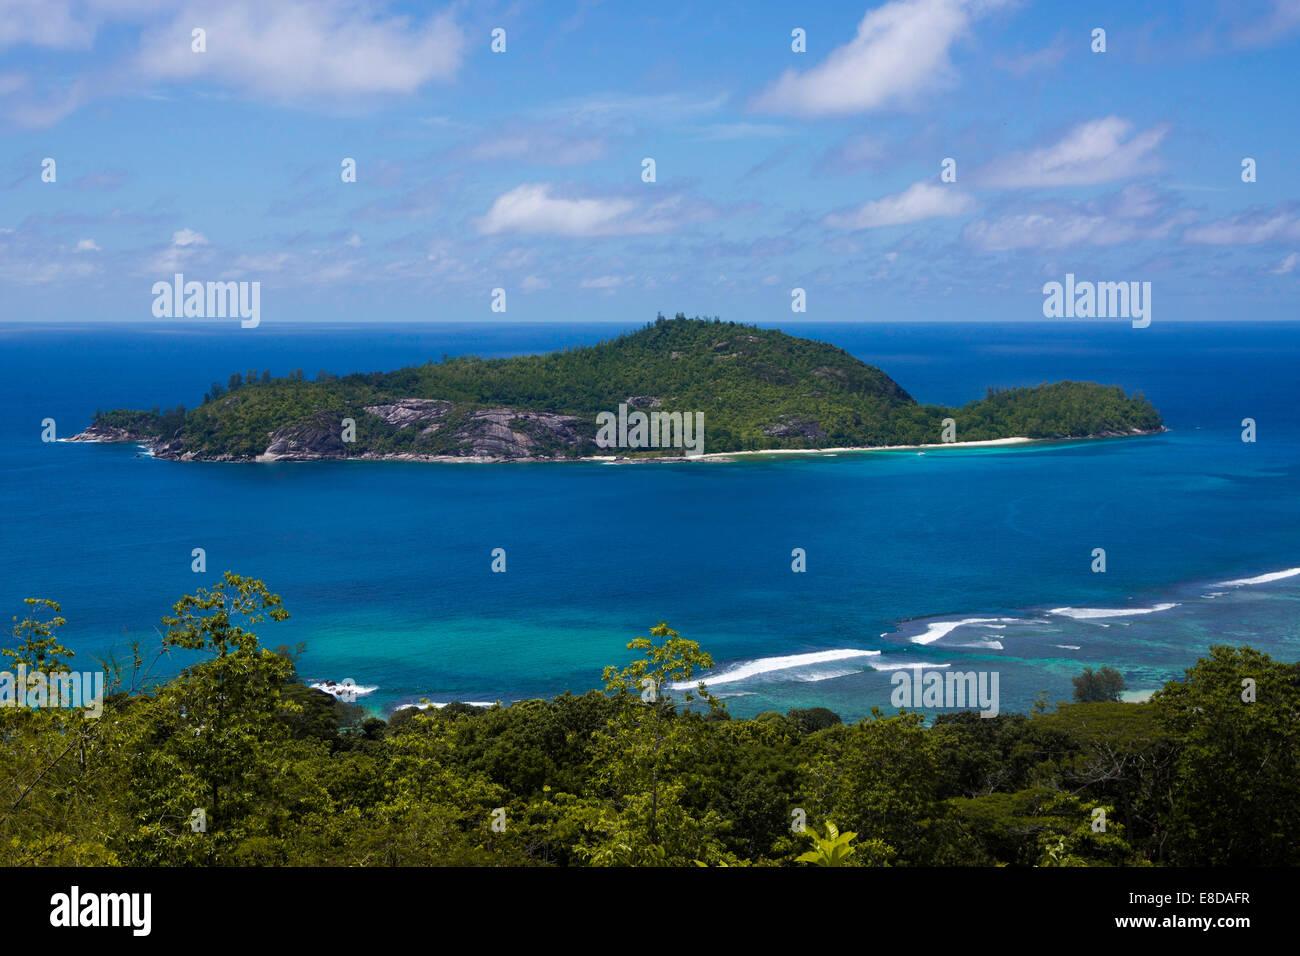 View towards Therese Island, Mahe, Seychelles - Stock Image